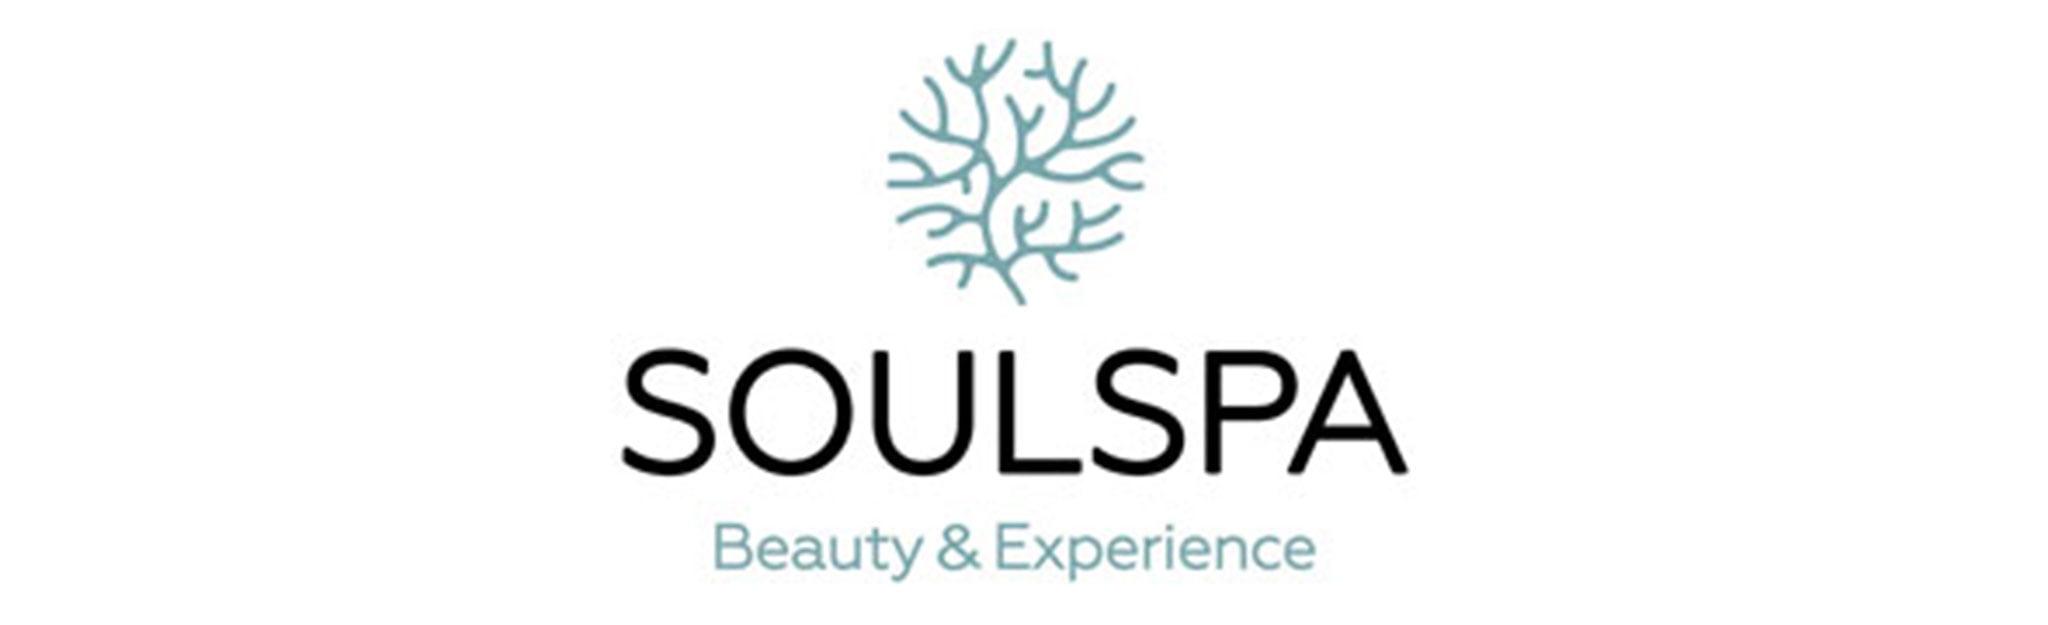 Logotipo Soulspa Beauty & Experience